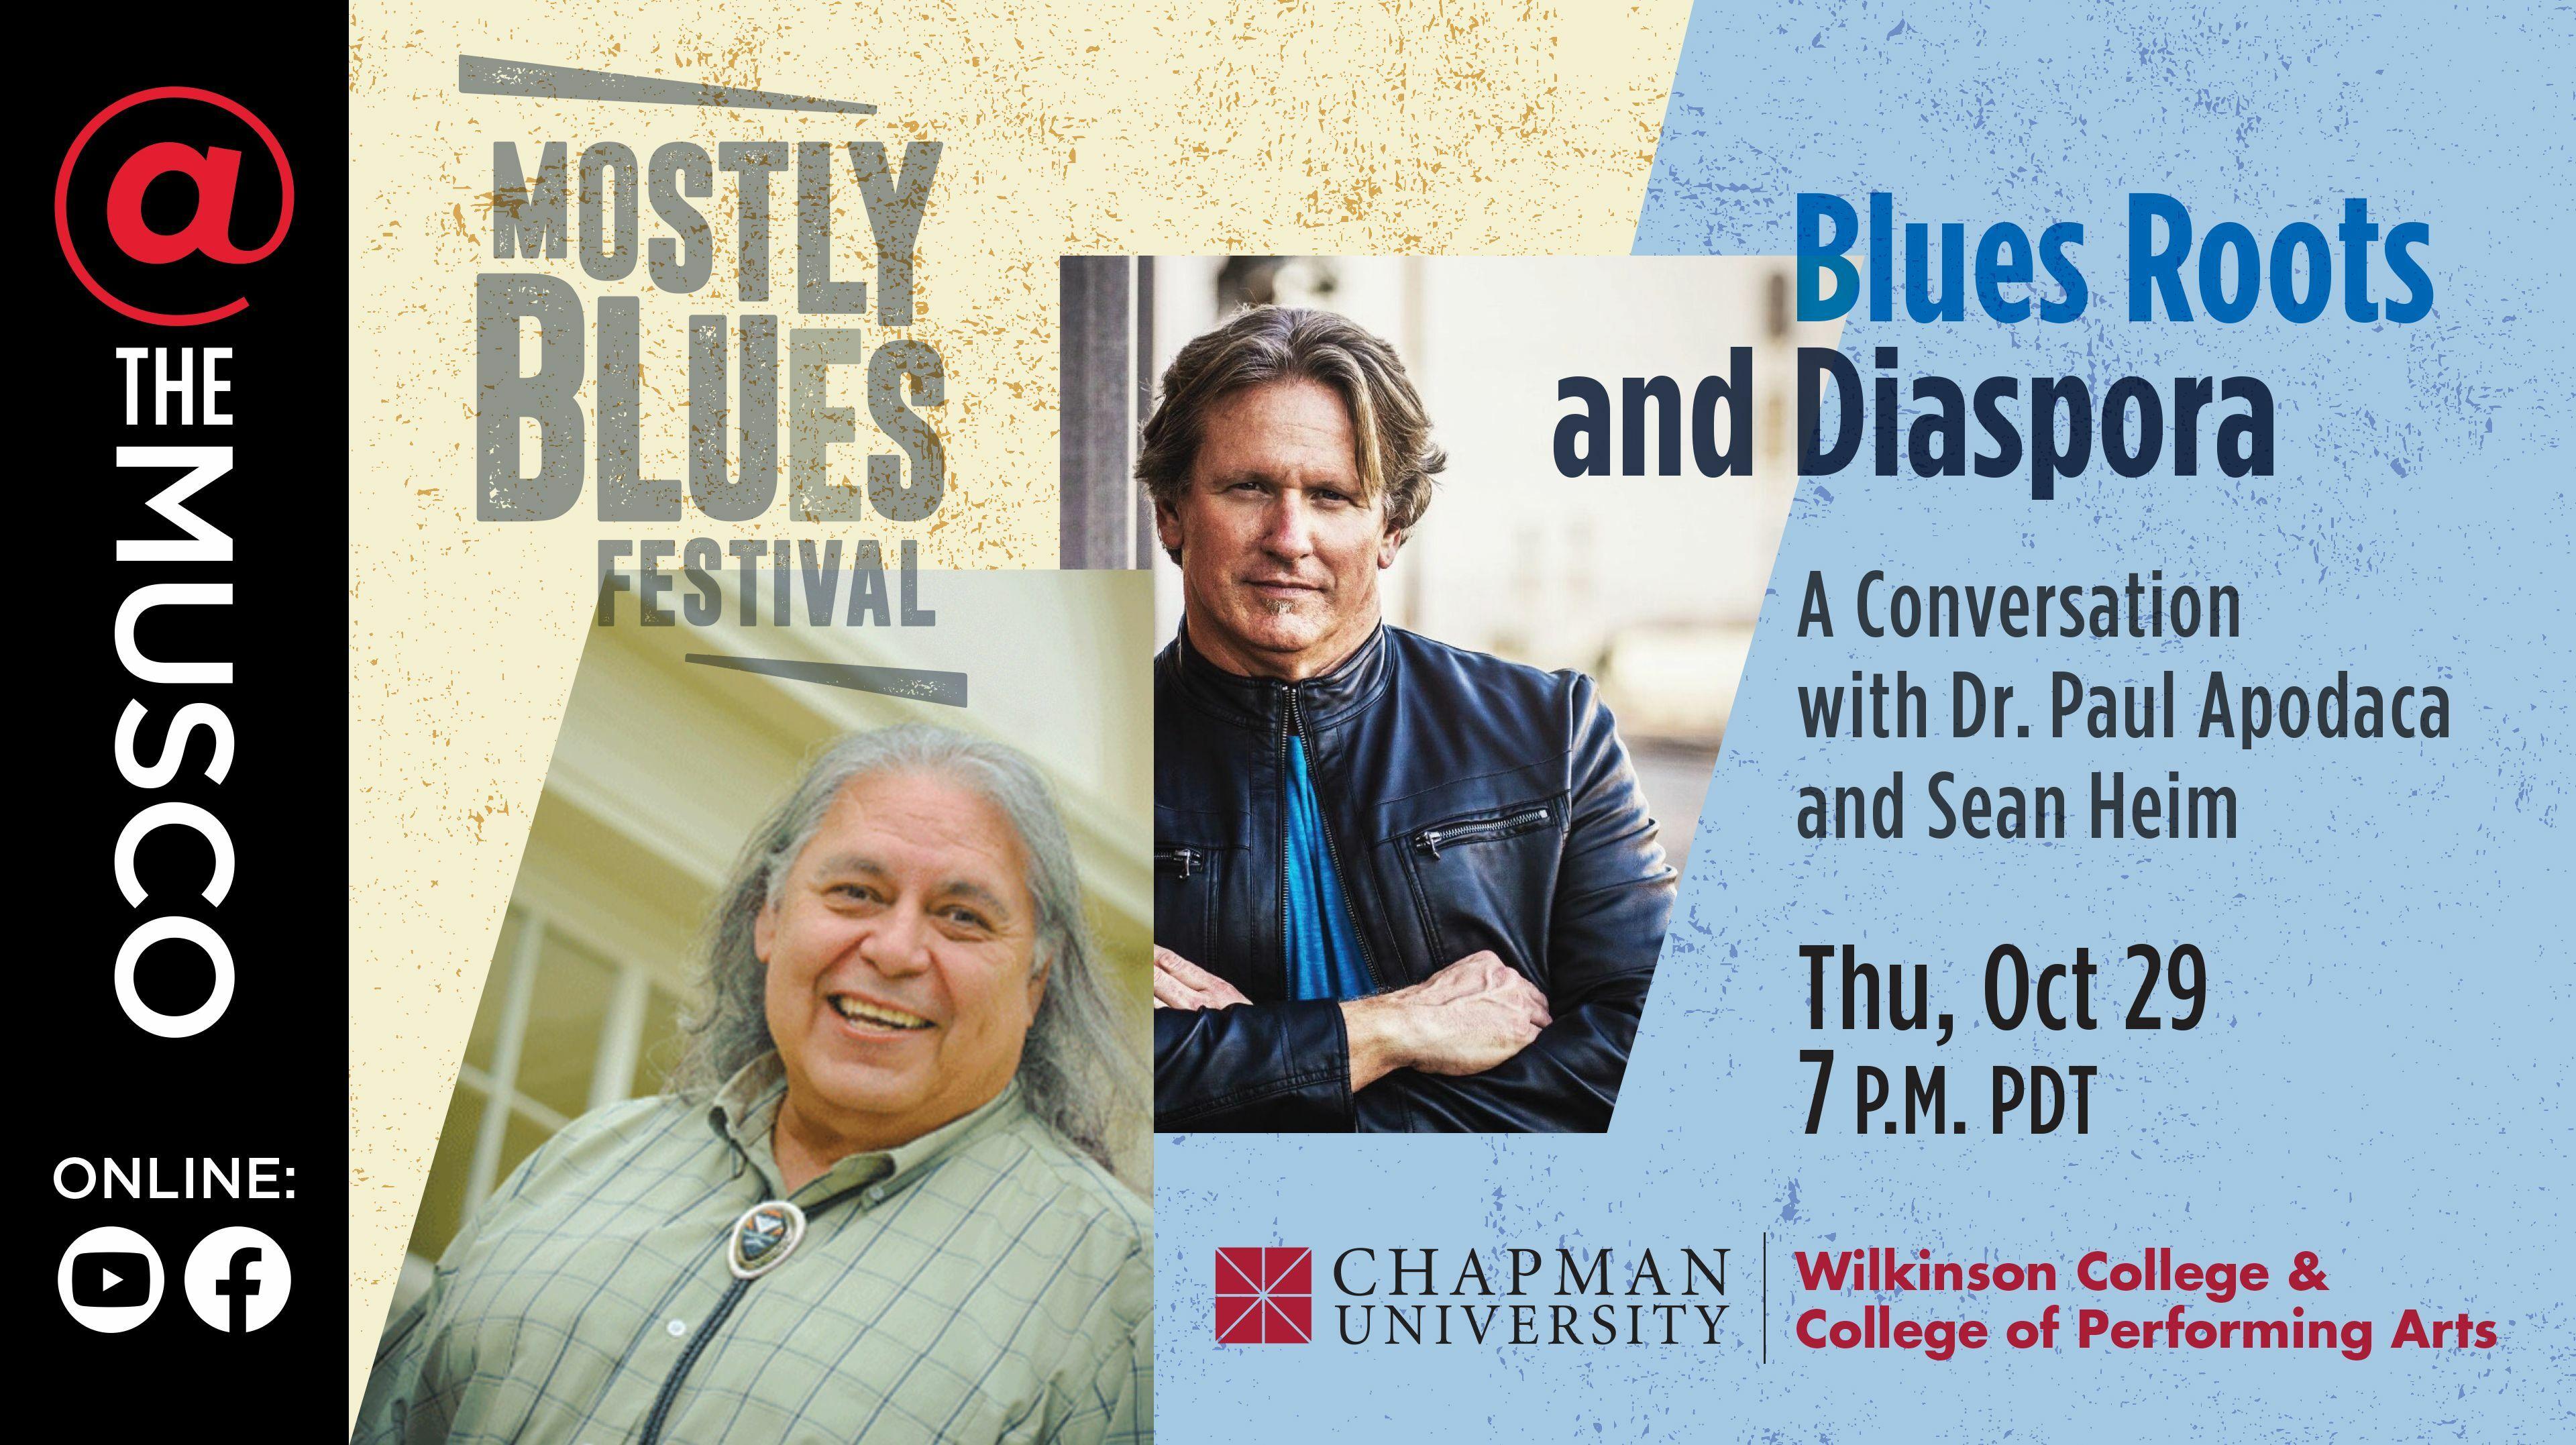 Blues Roots and Diaspora -- Online